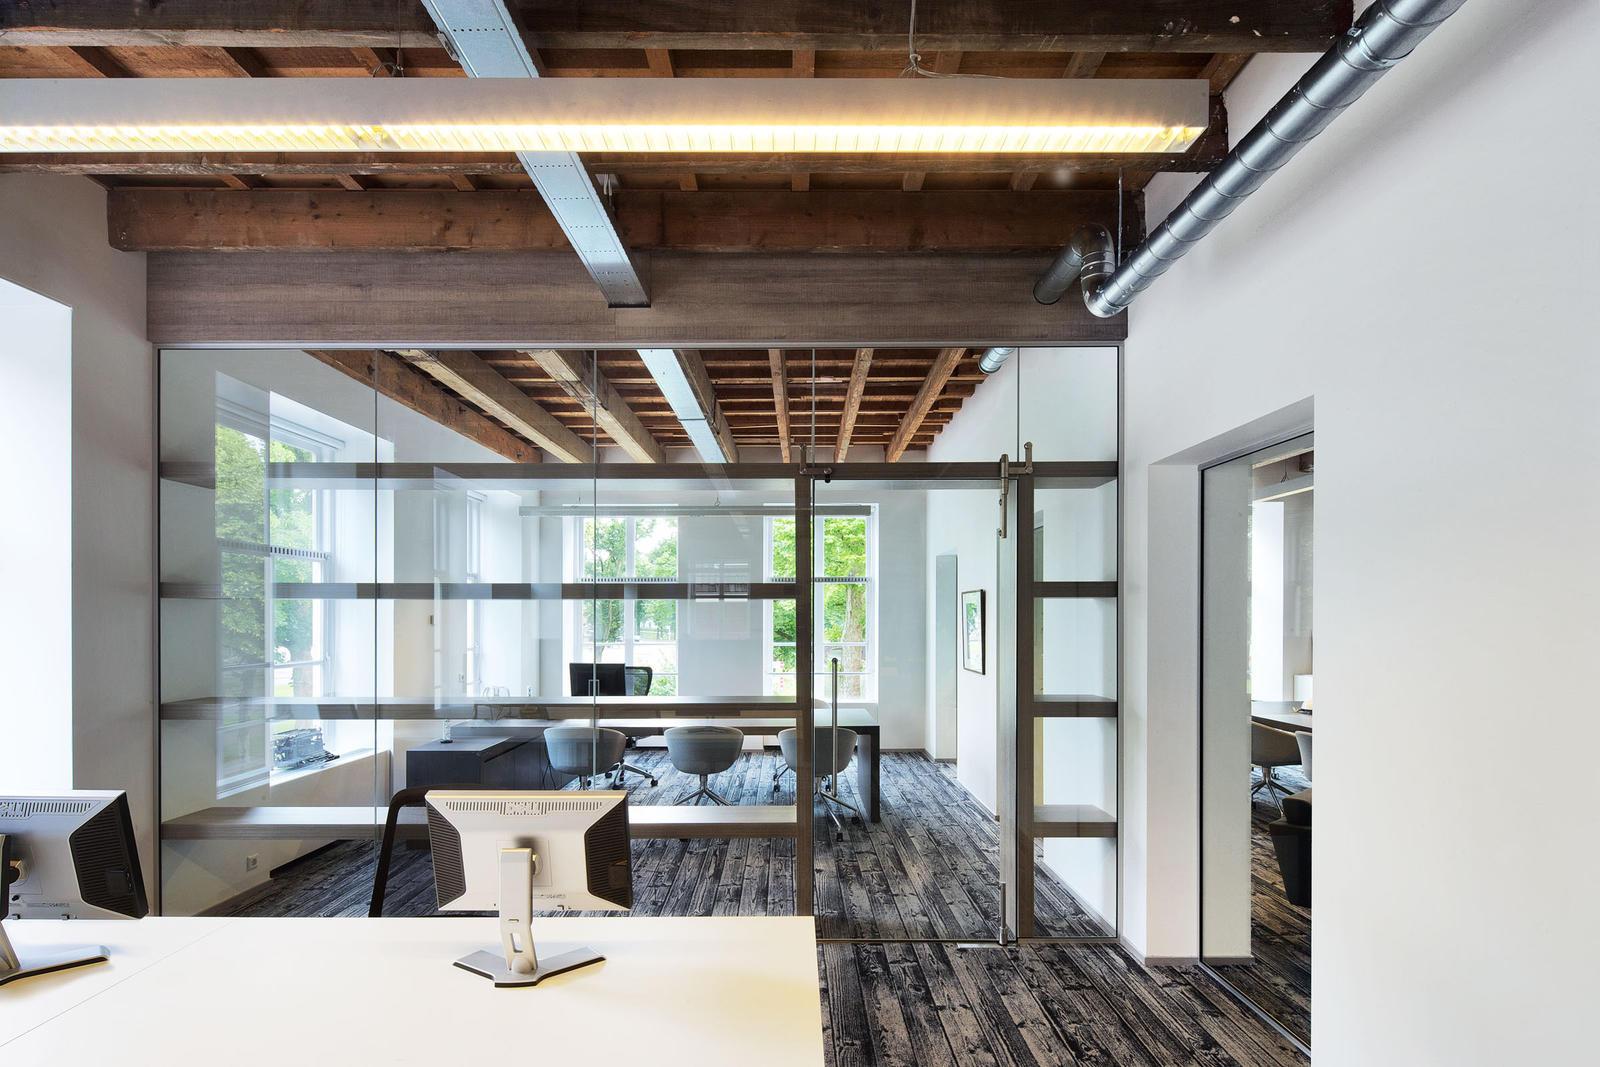 Interieur Inrichting Galerie : Maurice mentjens innenarchitektur born05